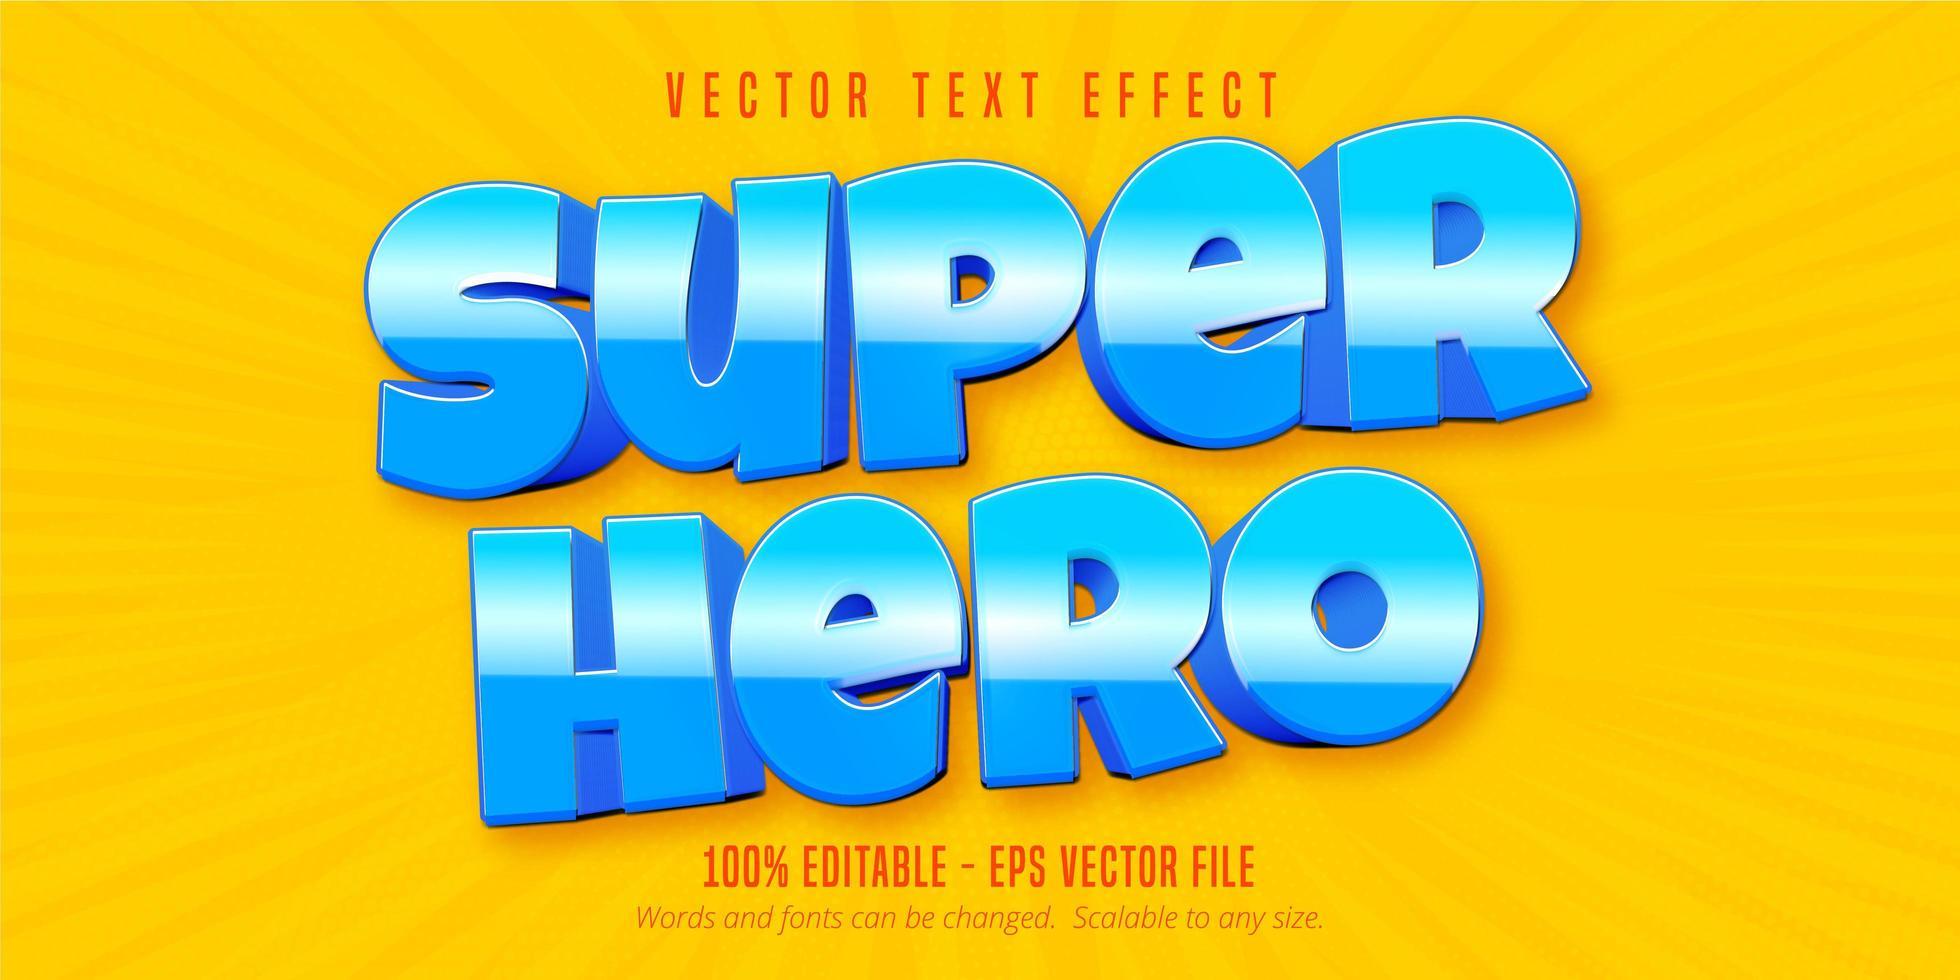 texte de super héros en gras vecteur